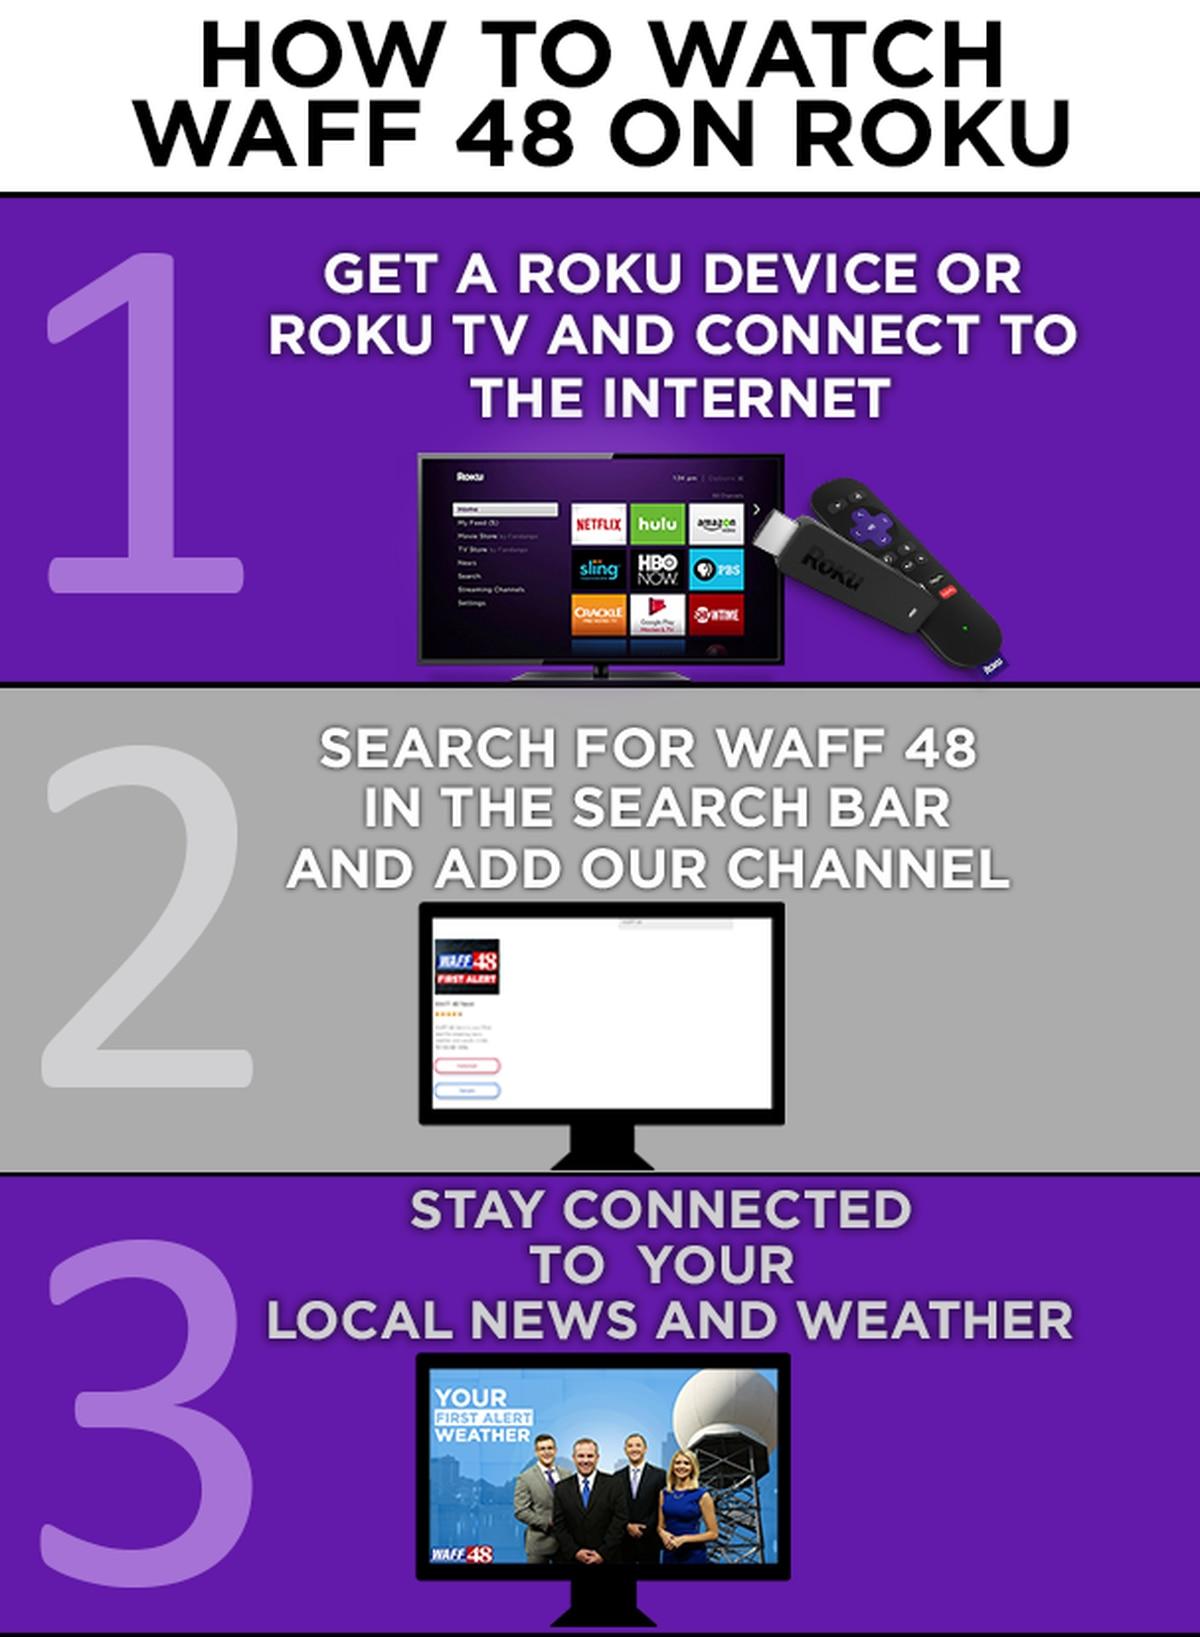 WATCH WAFF 48 on ROKU